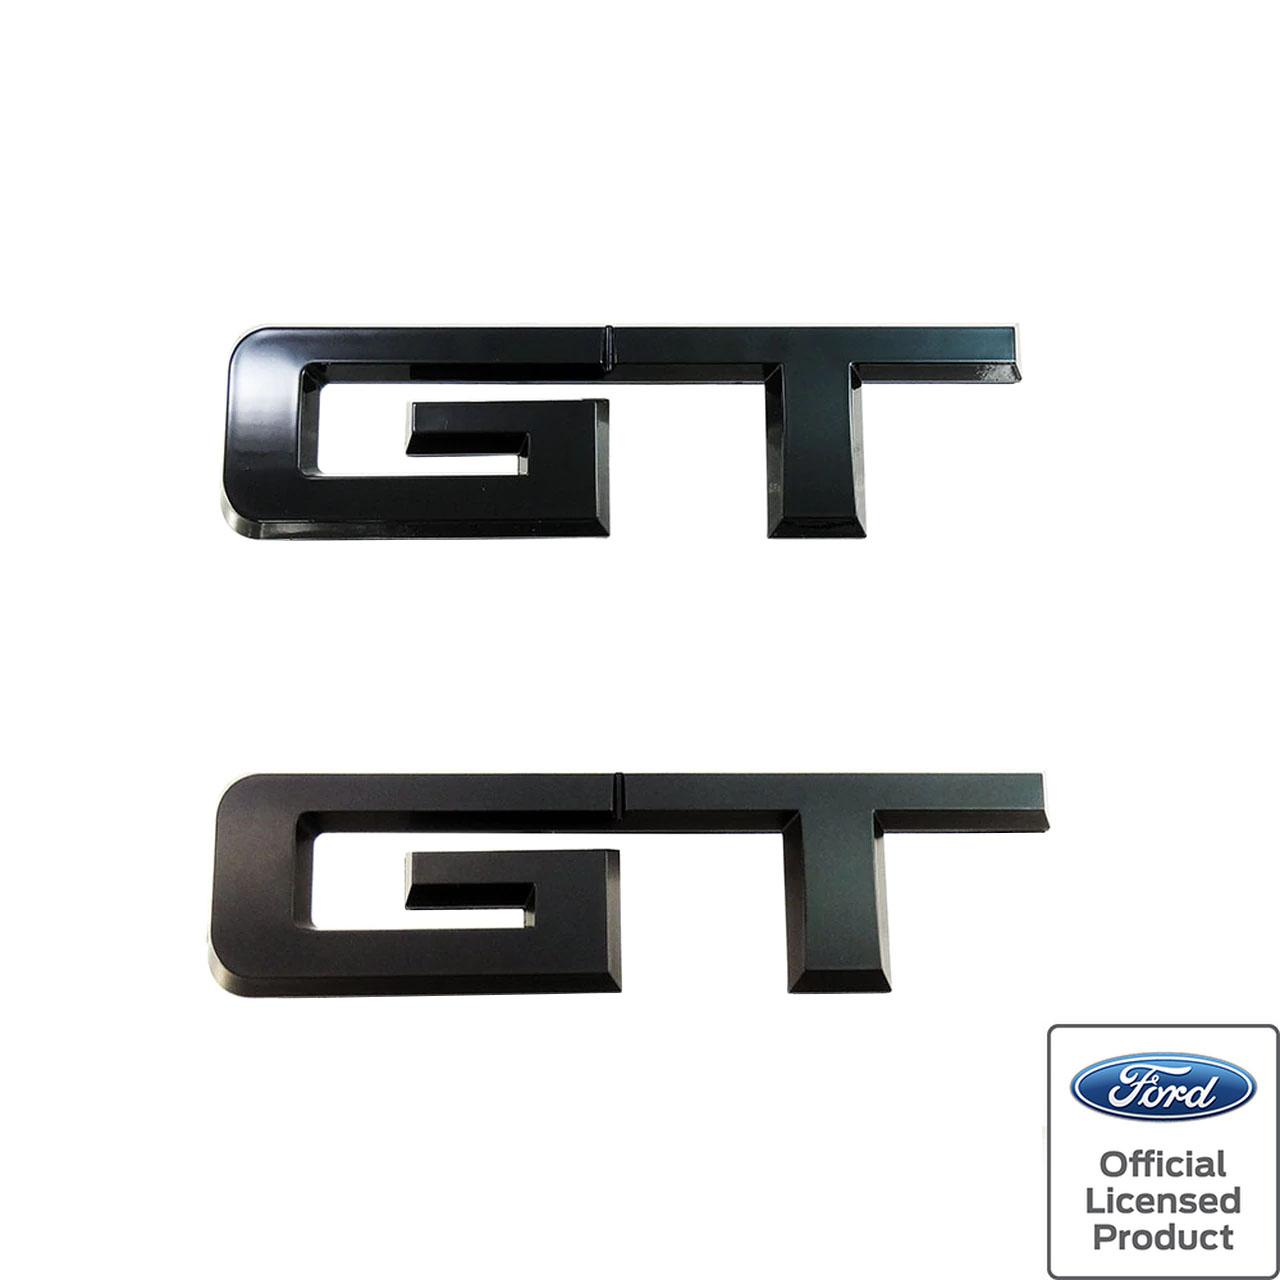 2015-2019 Mustang 5.0 GT Emblem Package Ruby Matte Black 4 Parts Kit